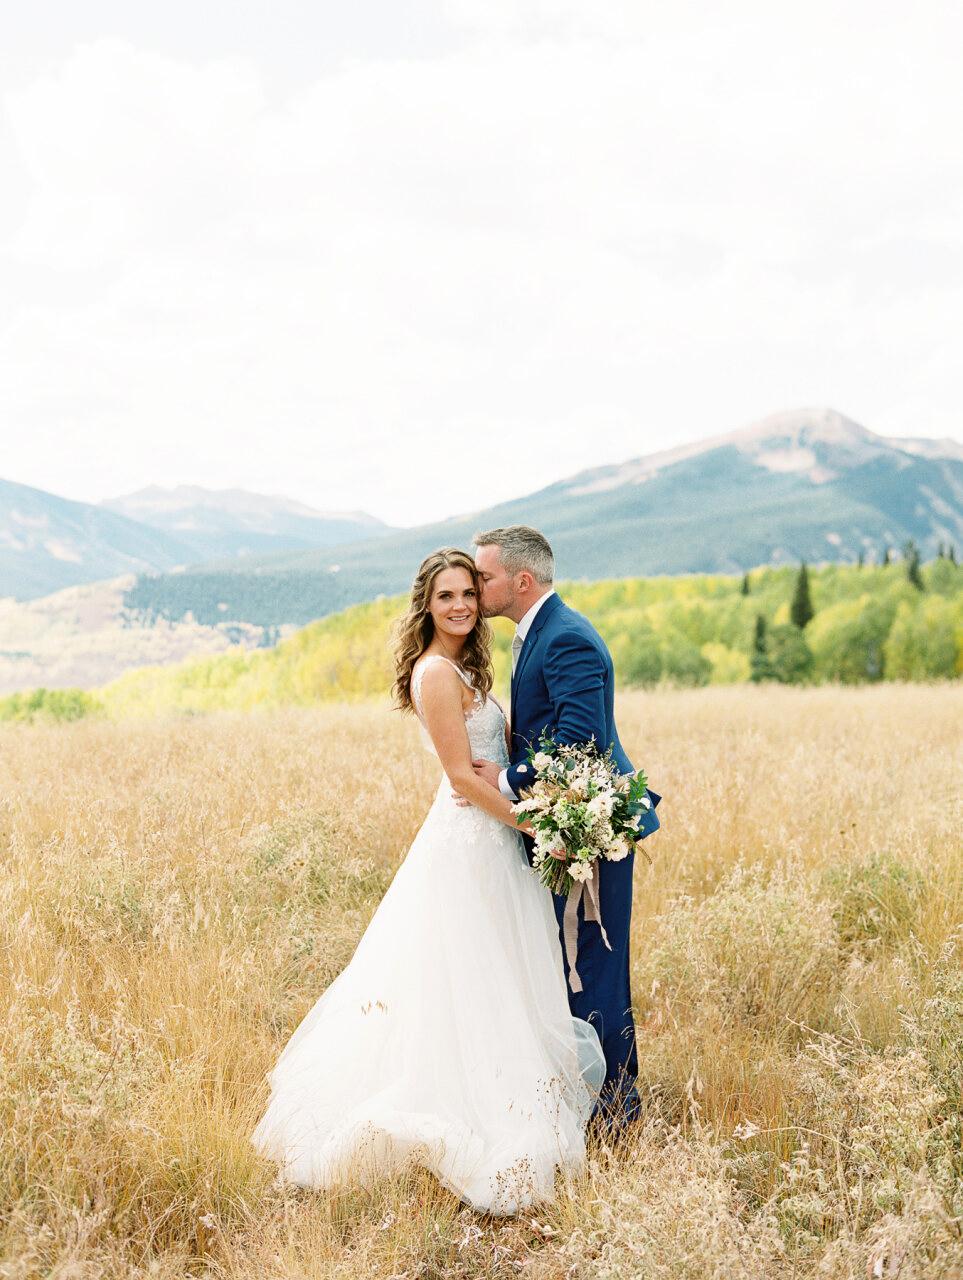 molly frank wedding couple in field